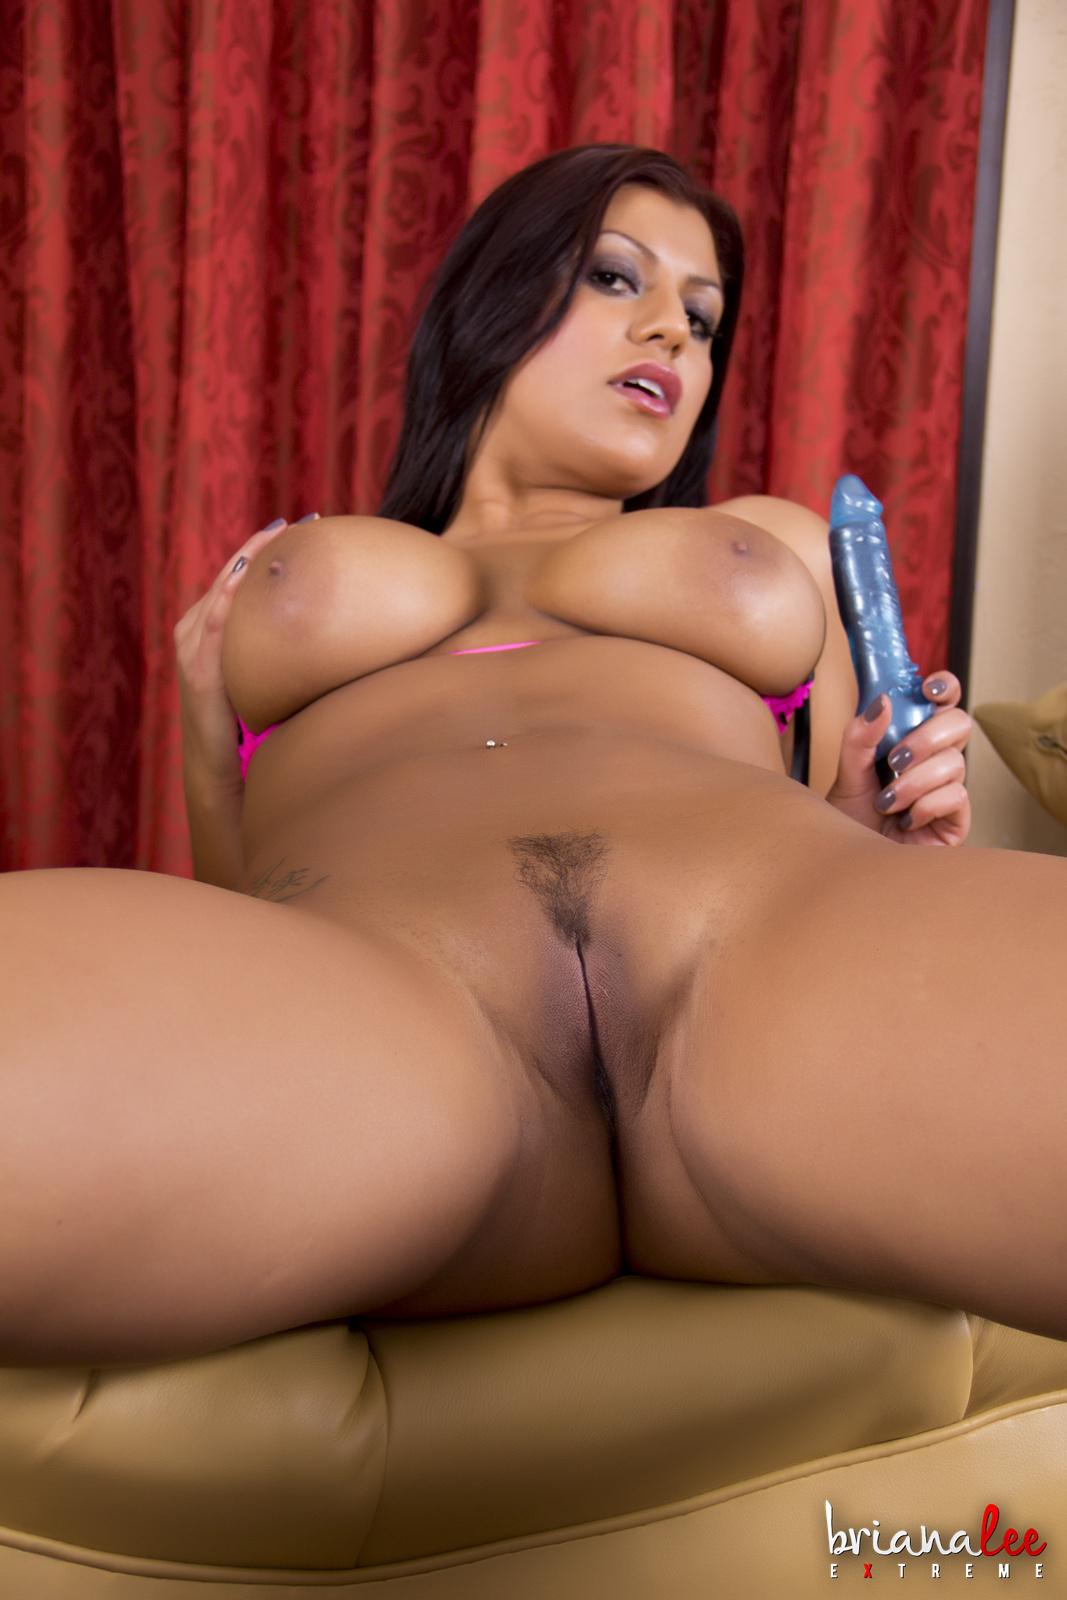 Brianna porn nude naked